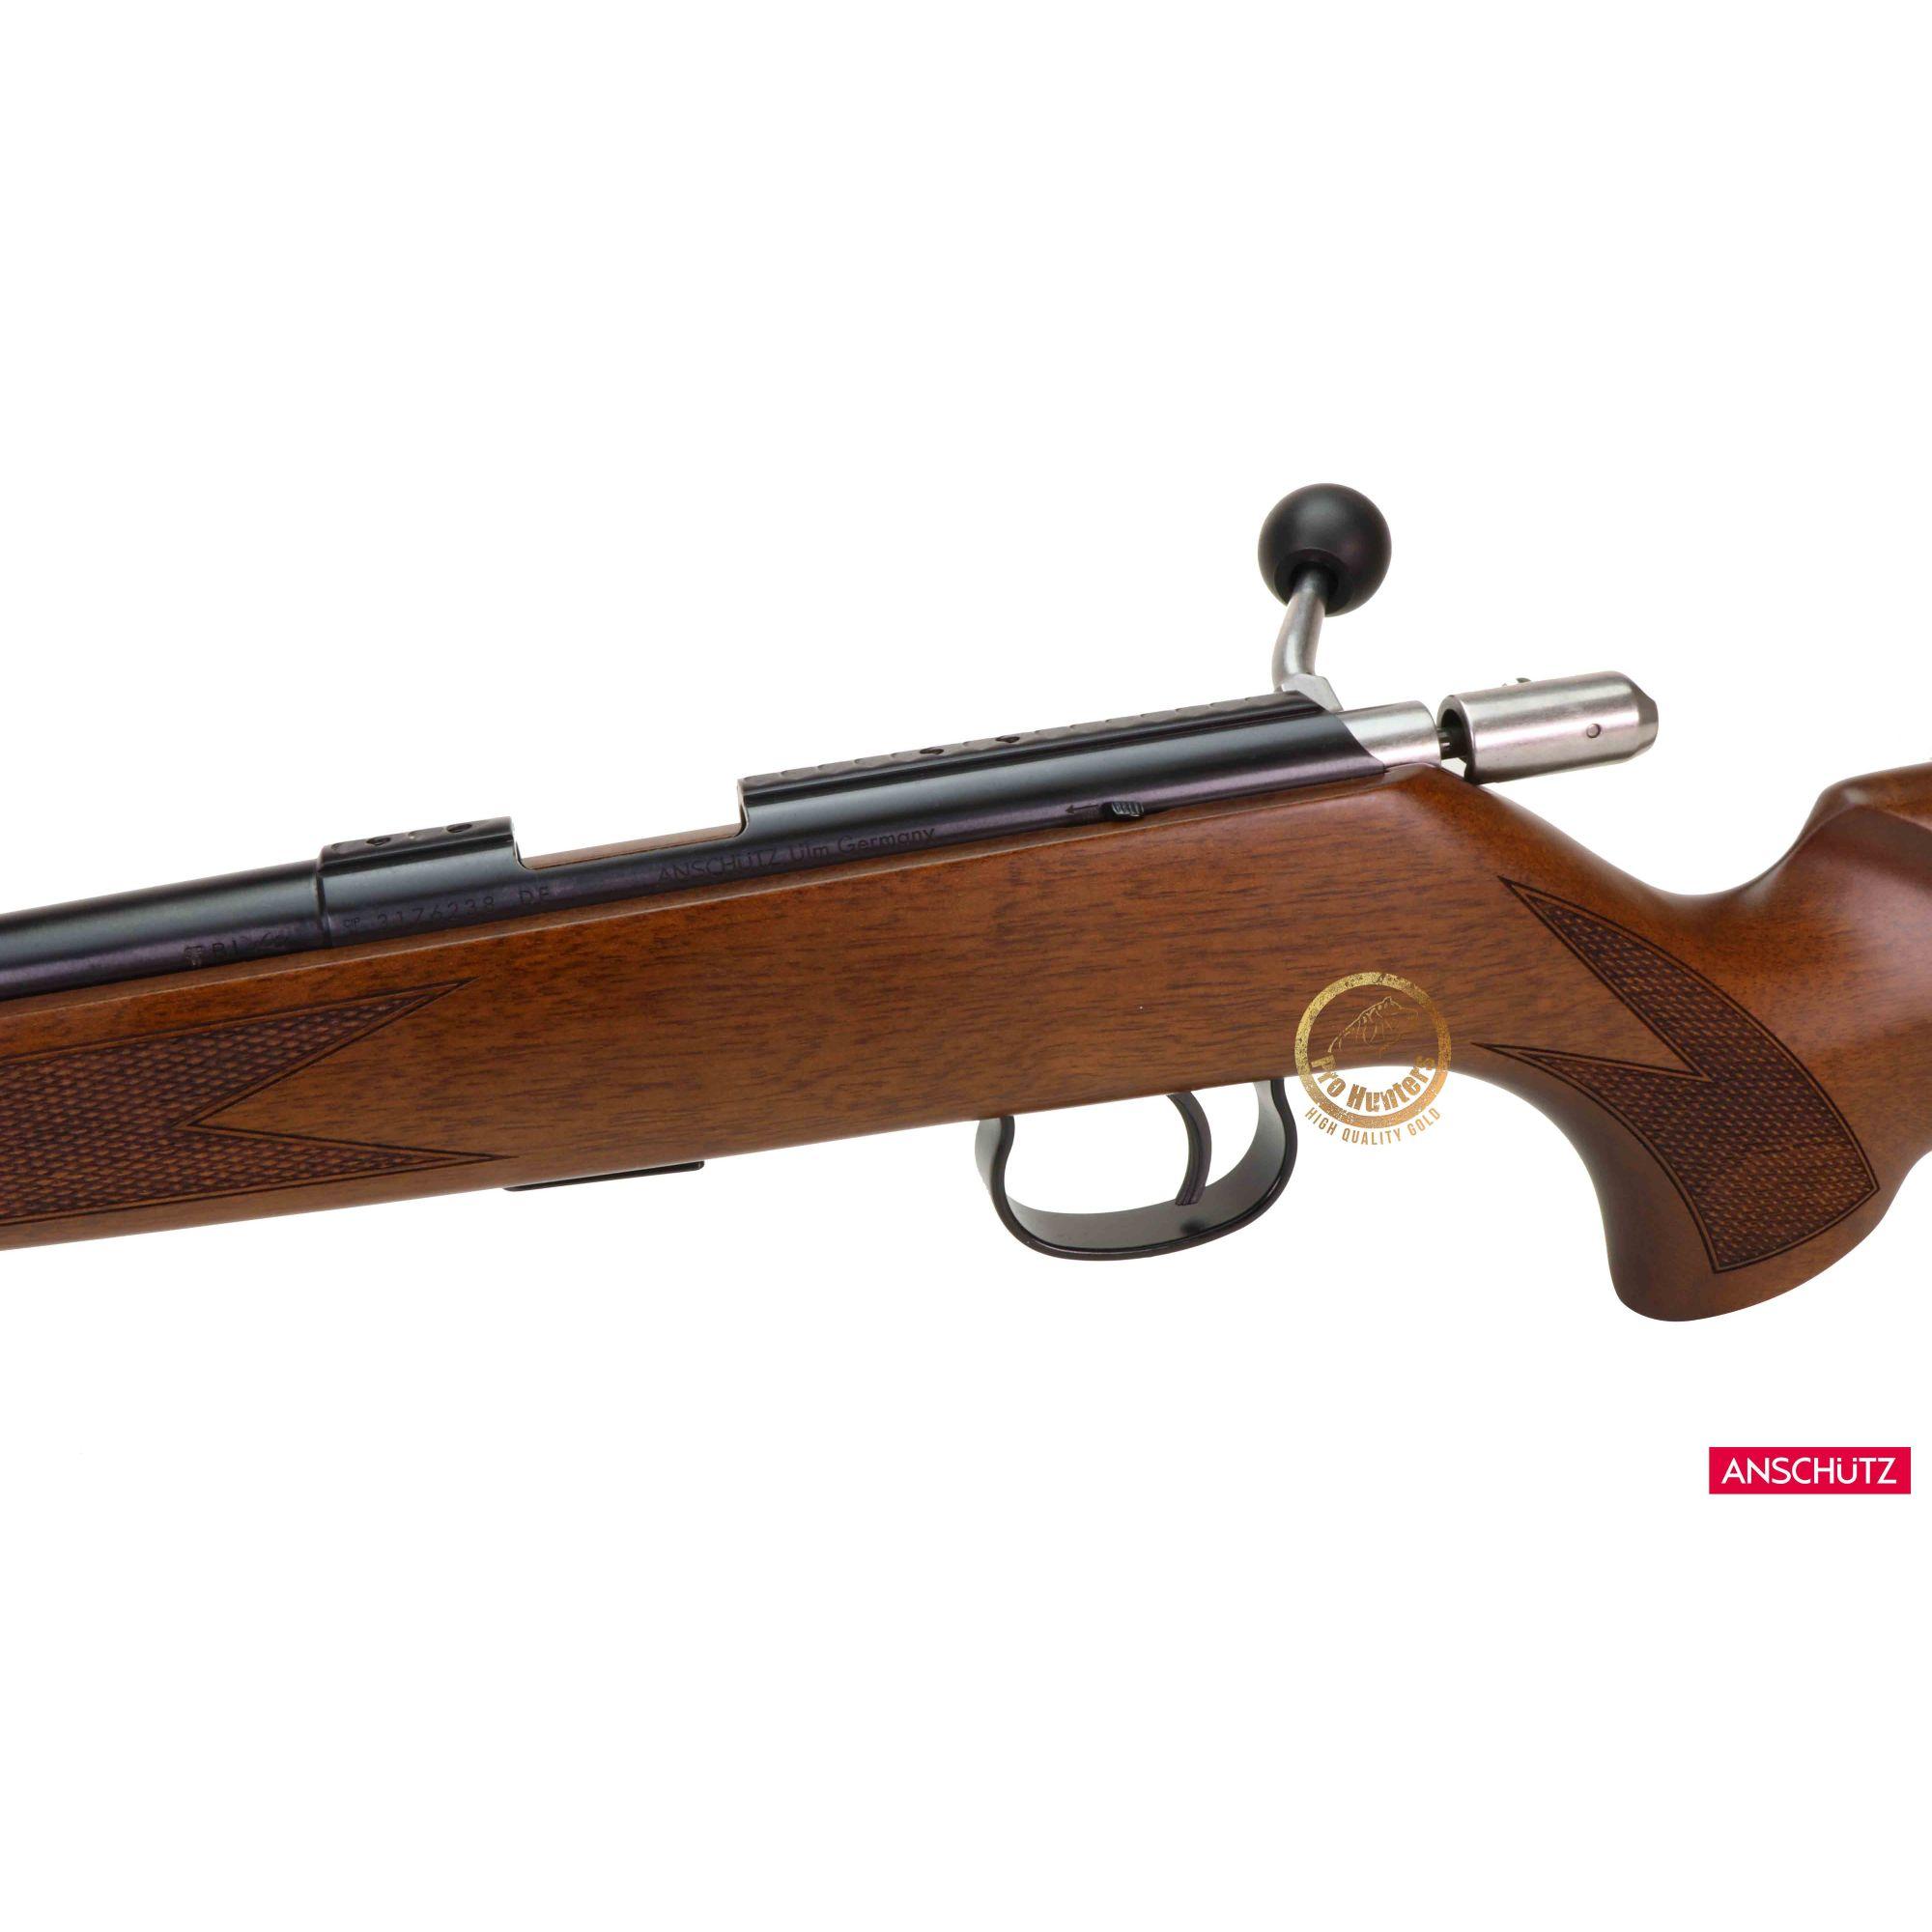 Rifle Anschutz 1416 D HB Classic - Calibre .22 LR